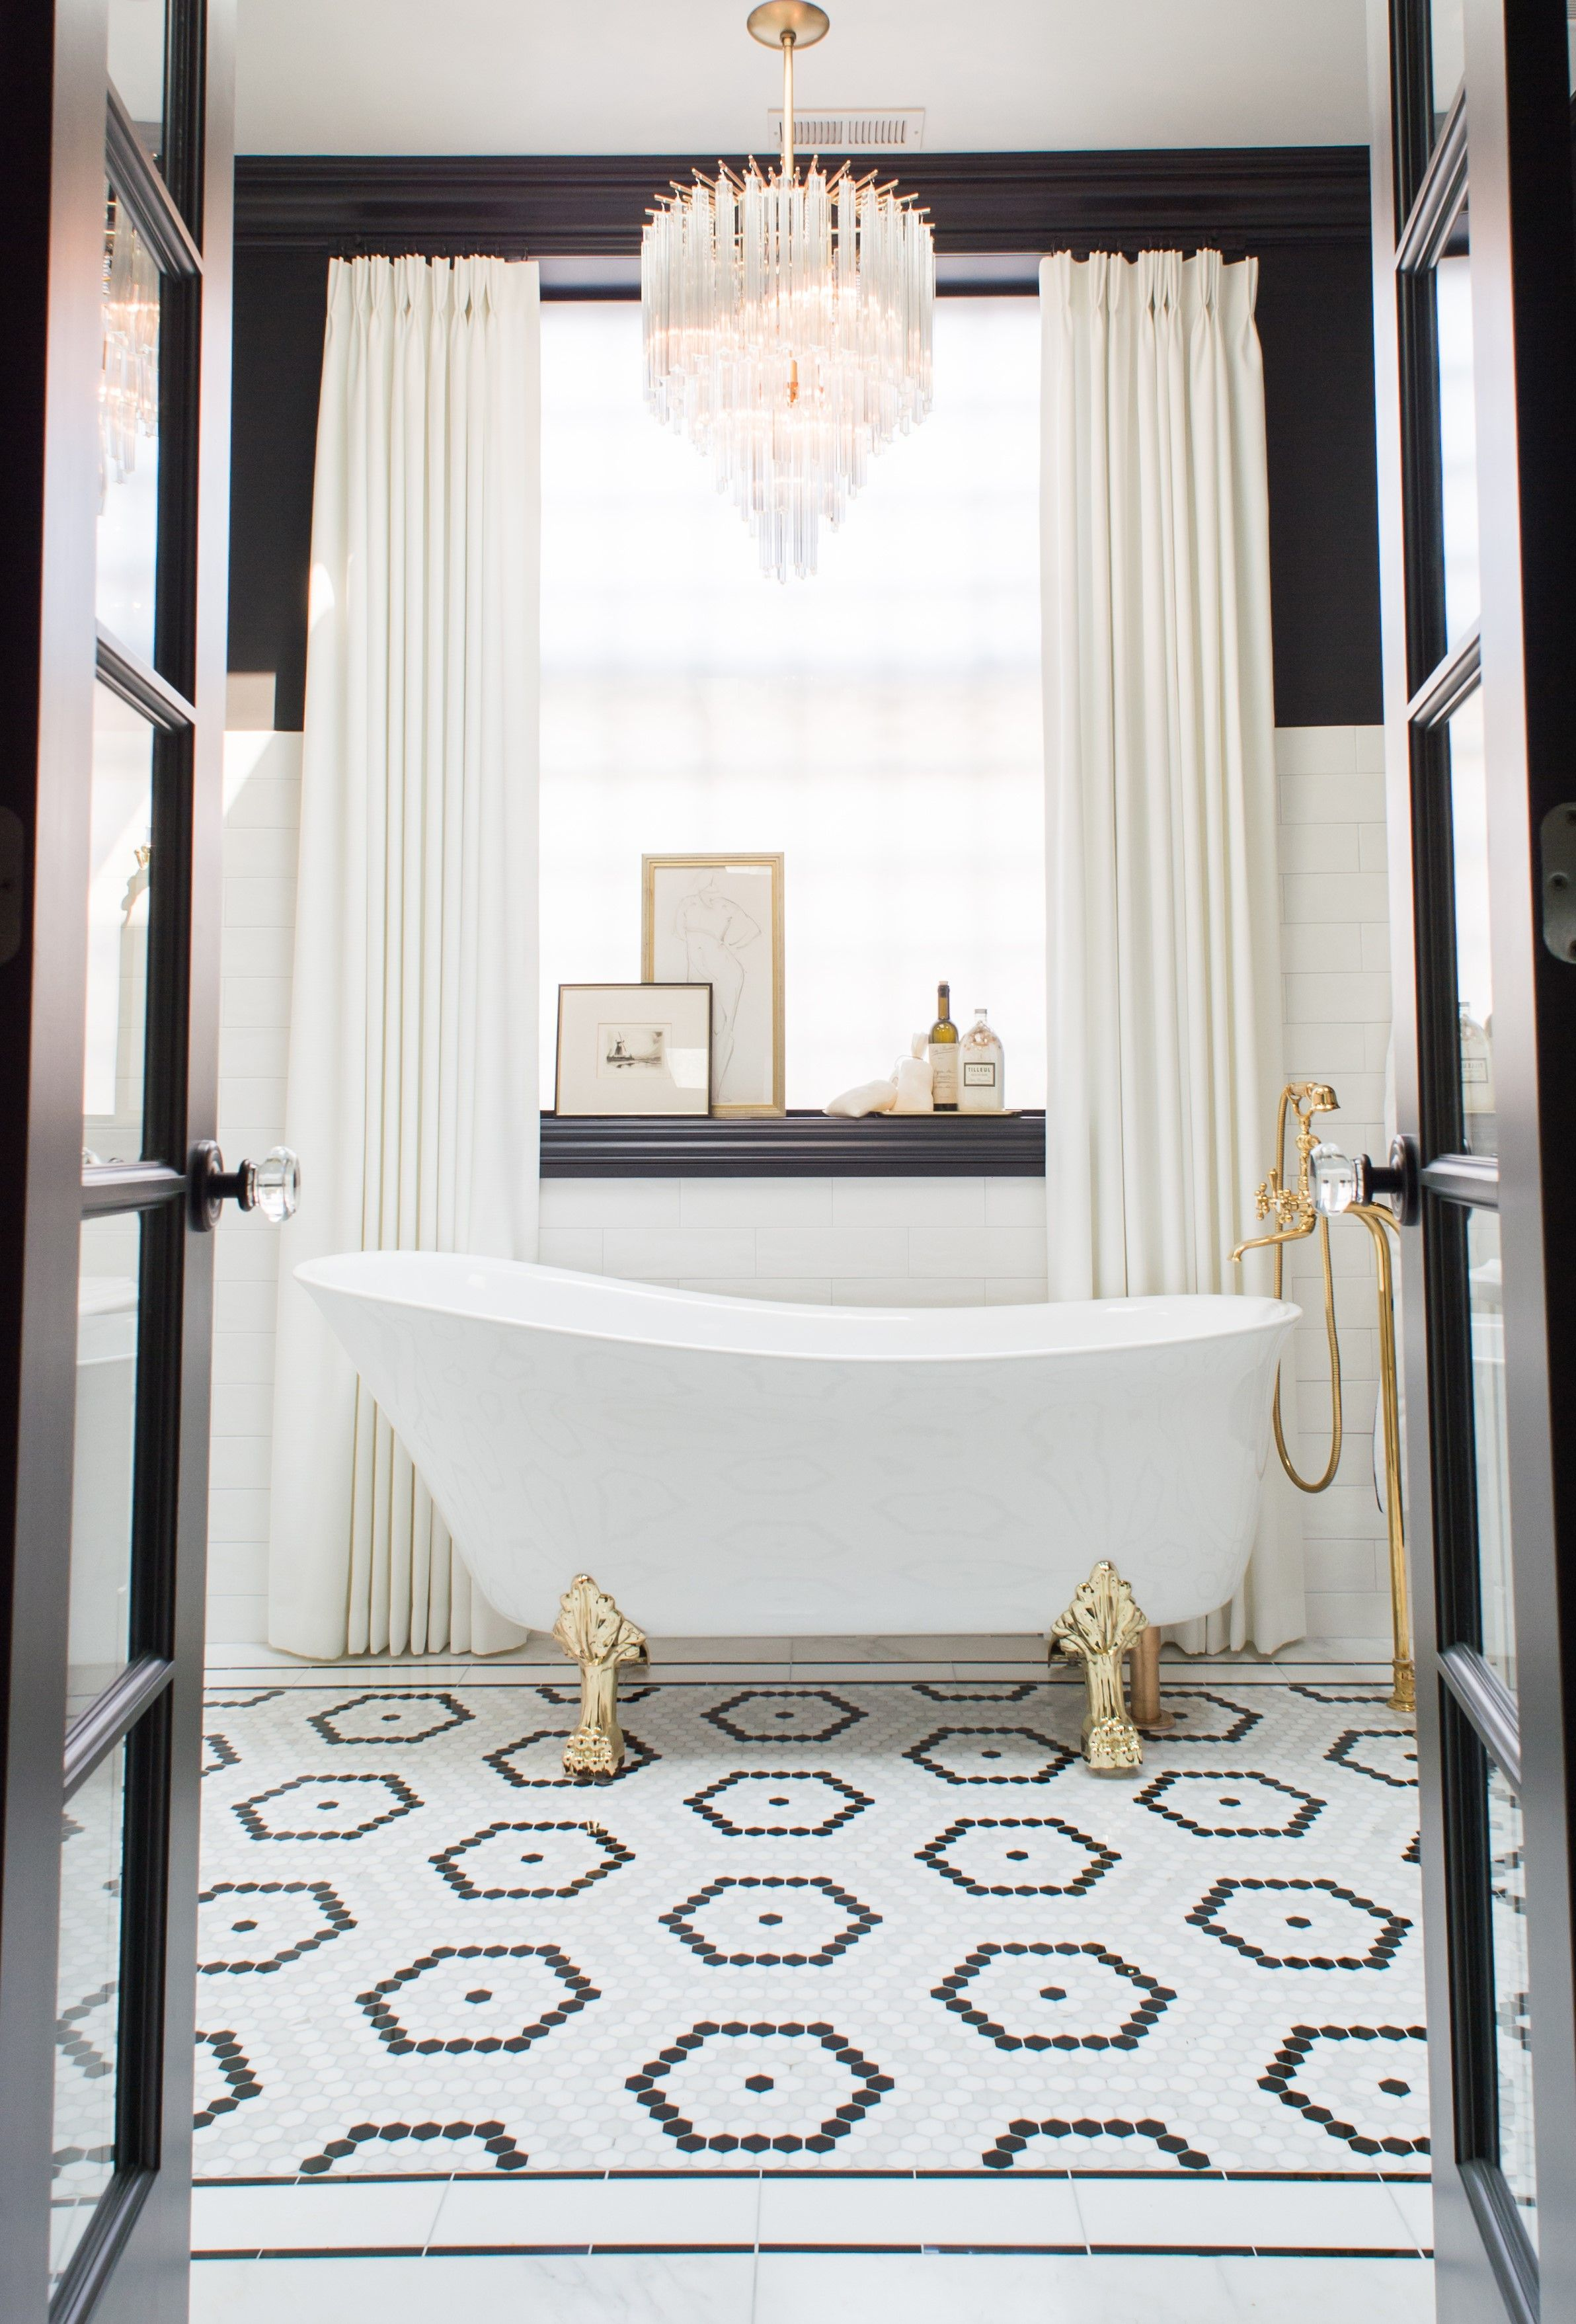 Black and White Bathroom | White bathroom tiles, Black ...